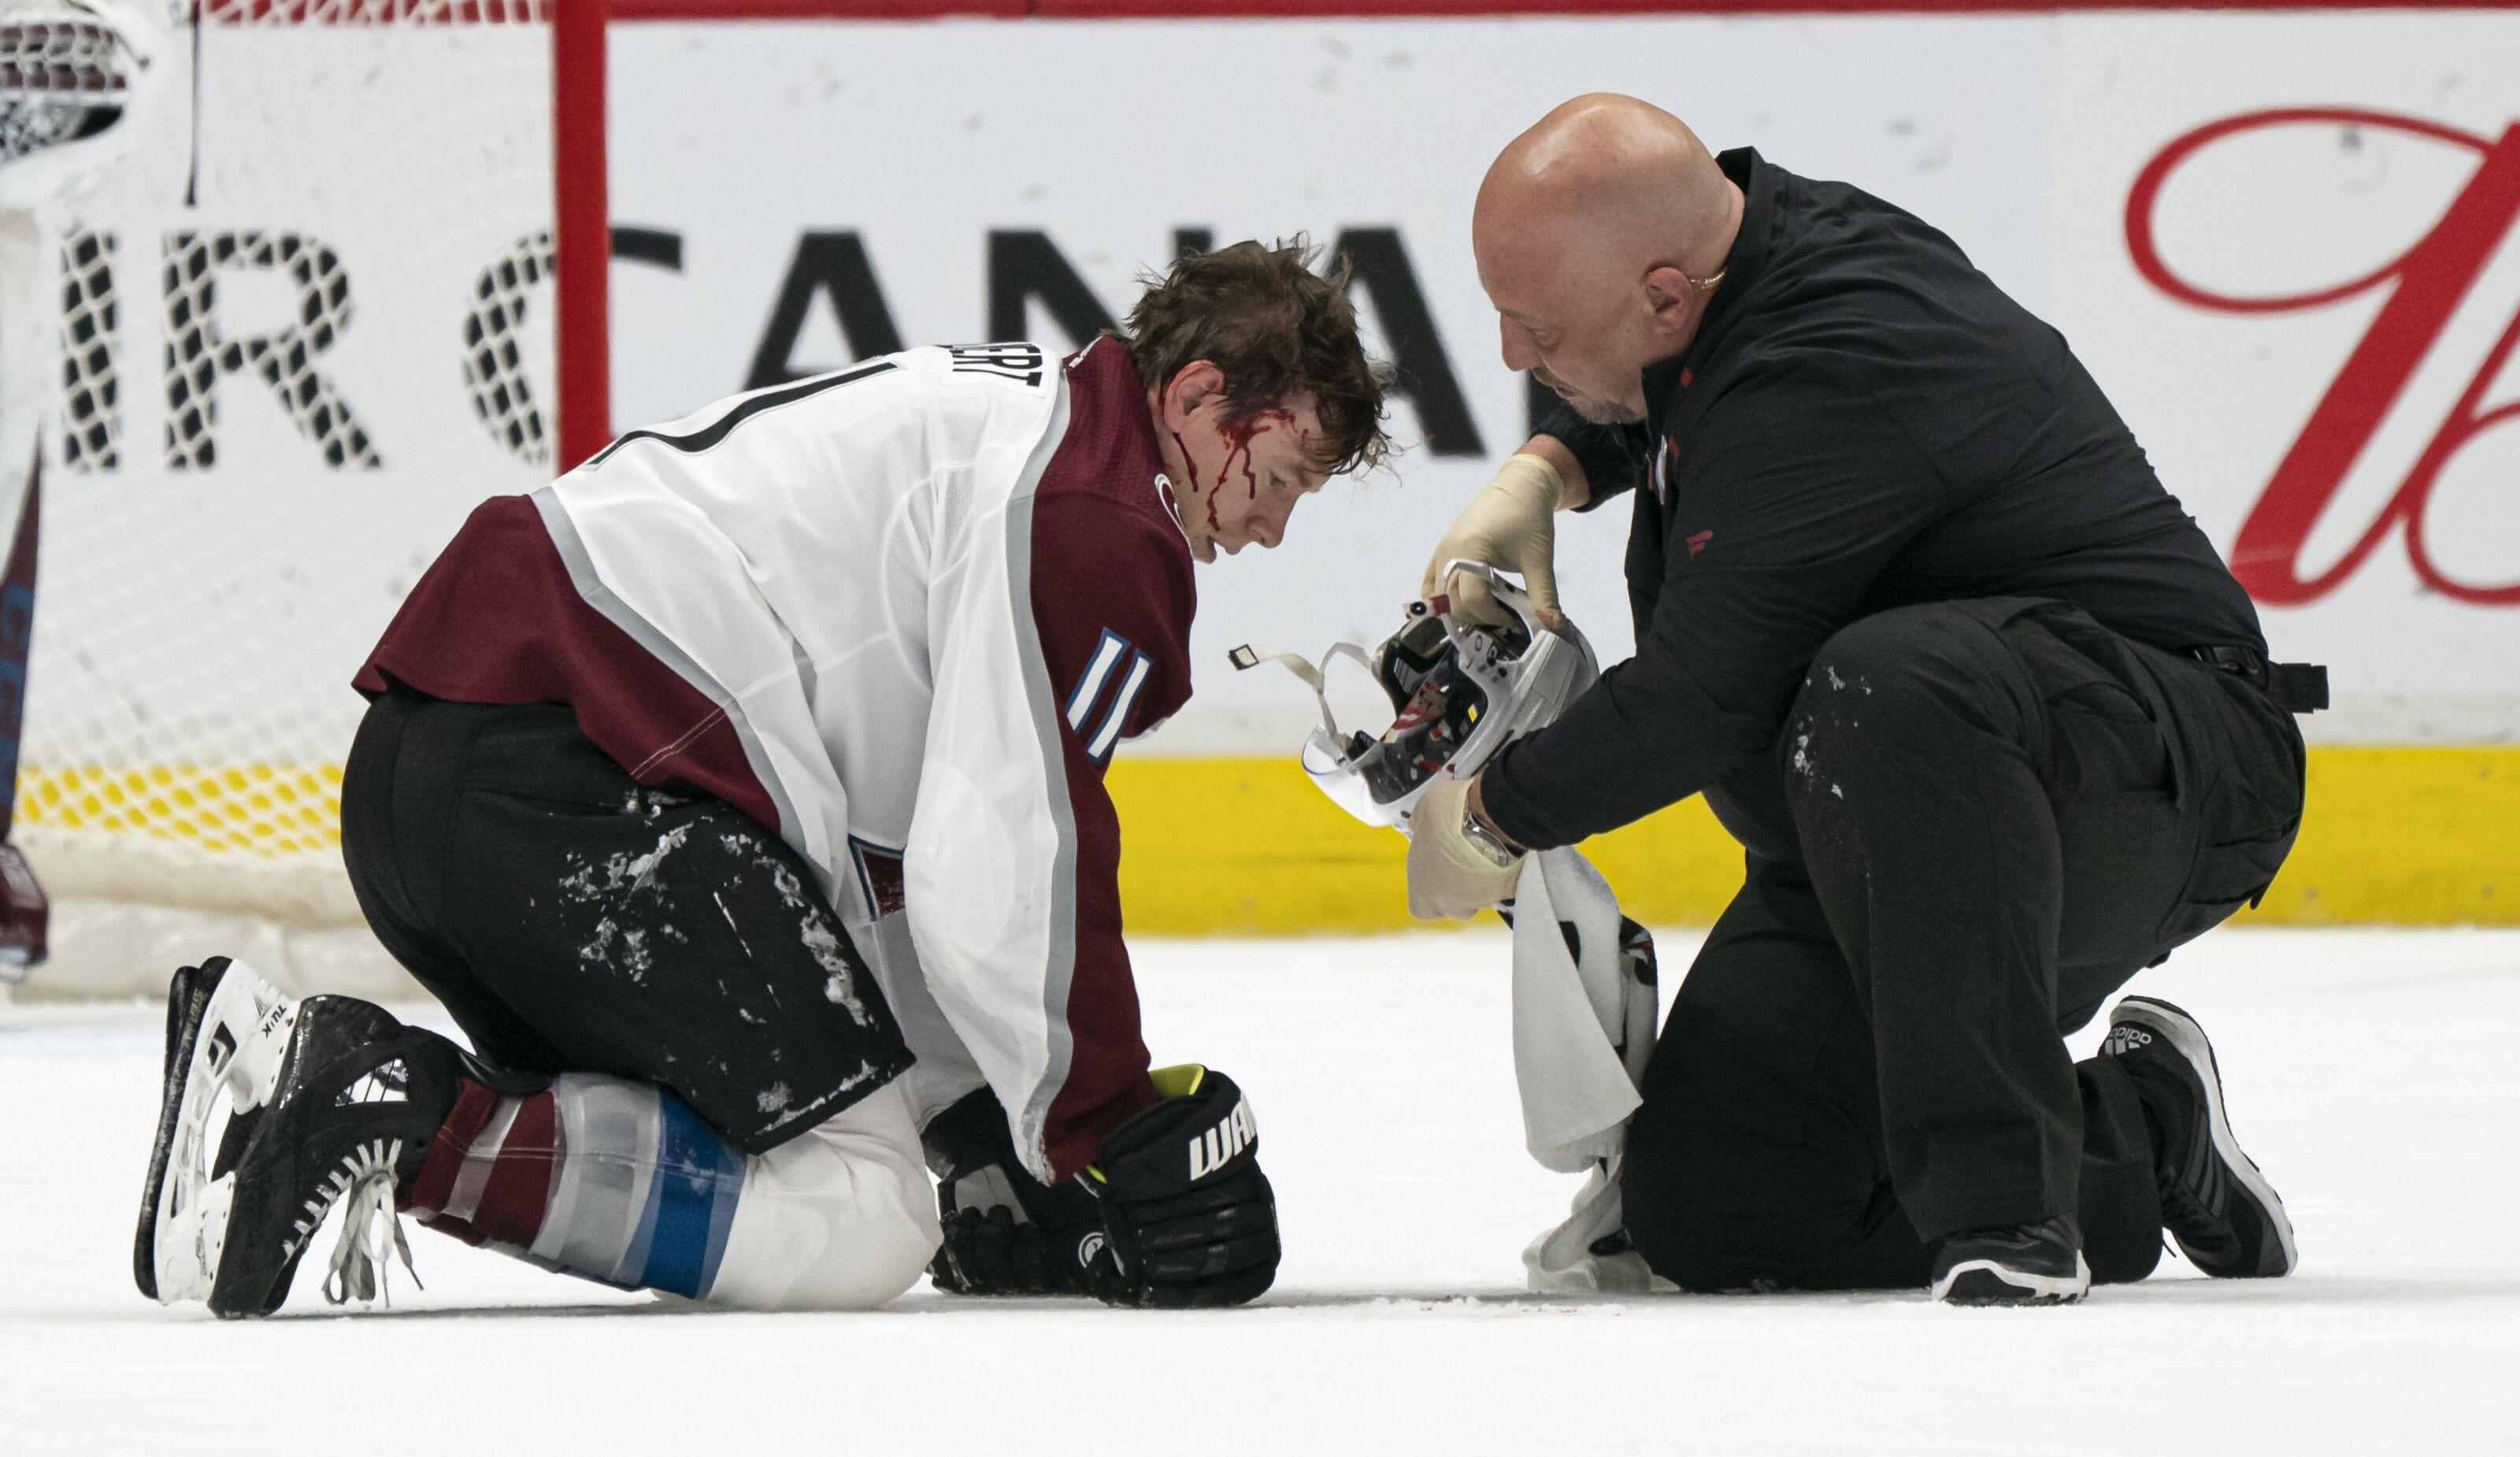 Avalanche's Matt Calvert injury showcases inconsistent, flawed NHL rule